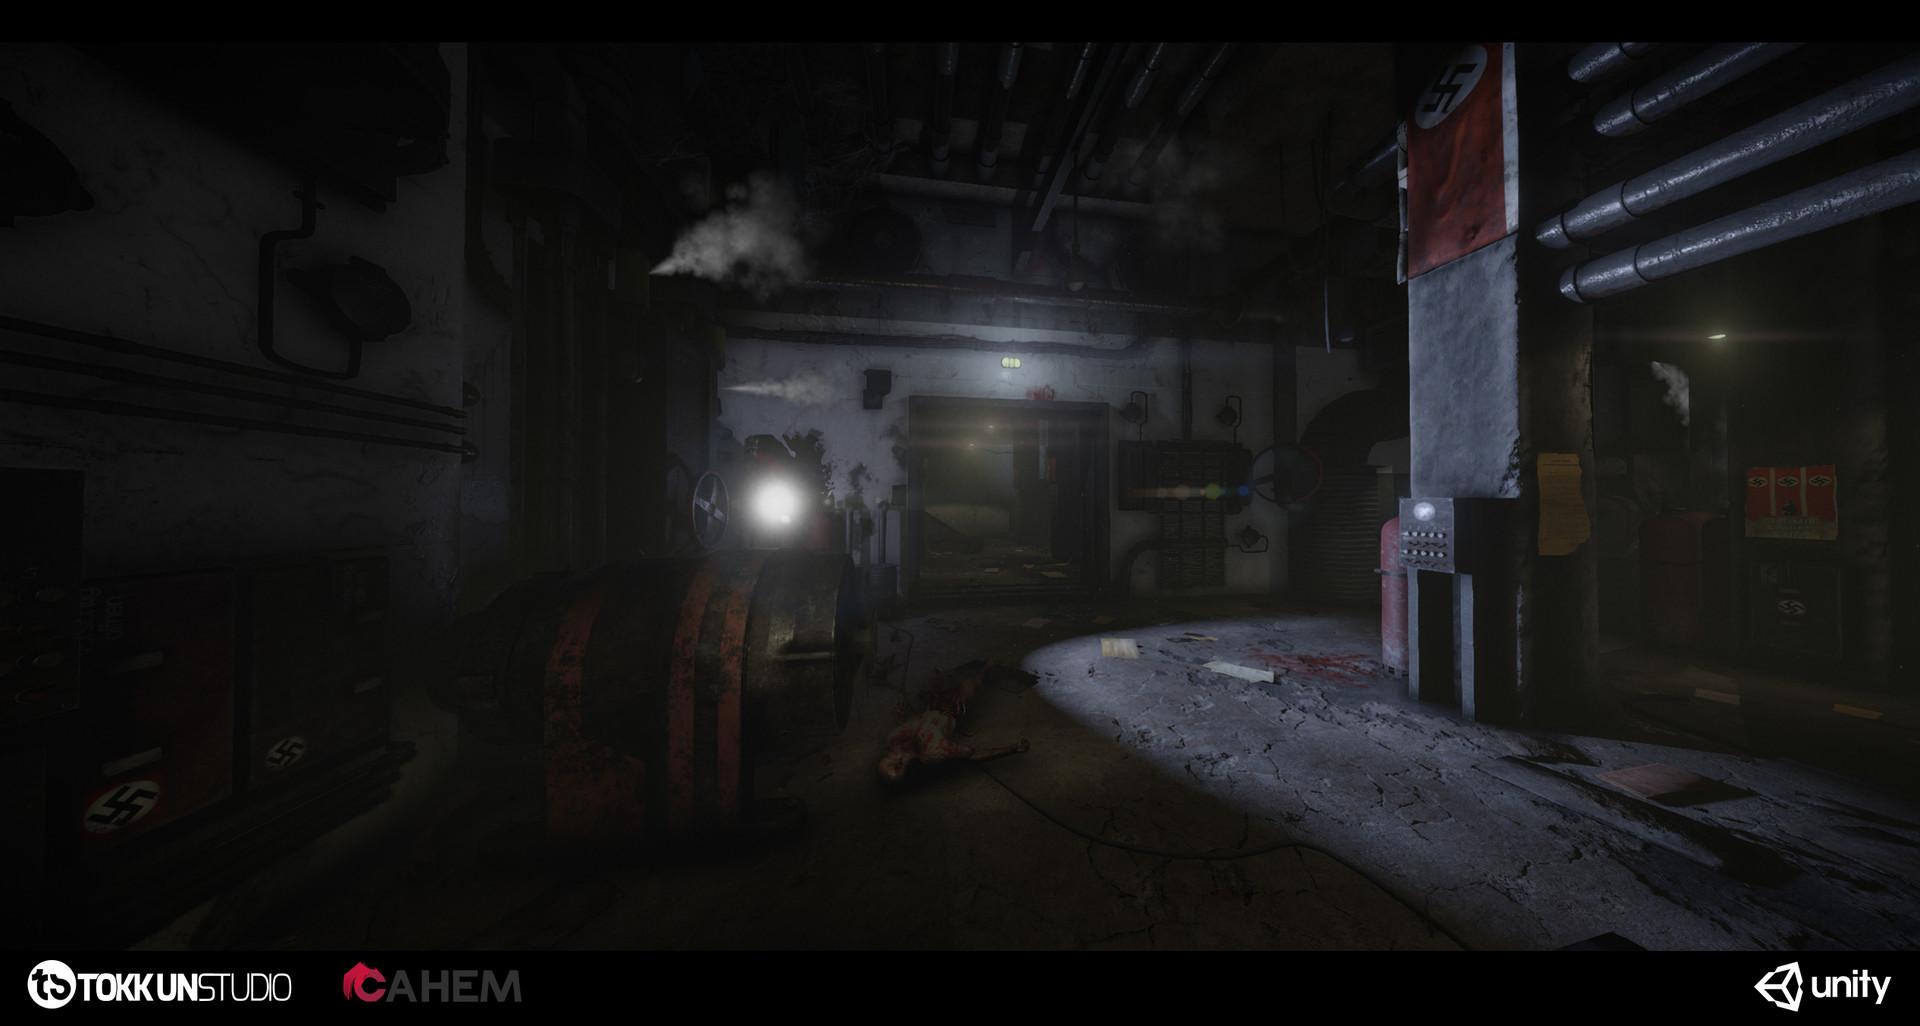 Tokkun studio bunker shot 37